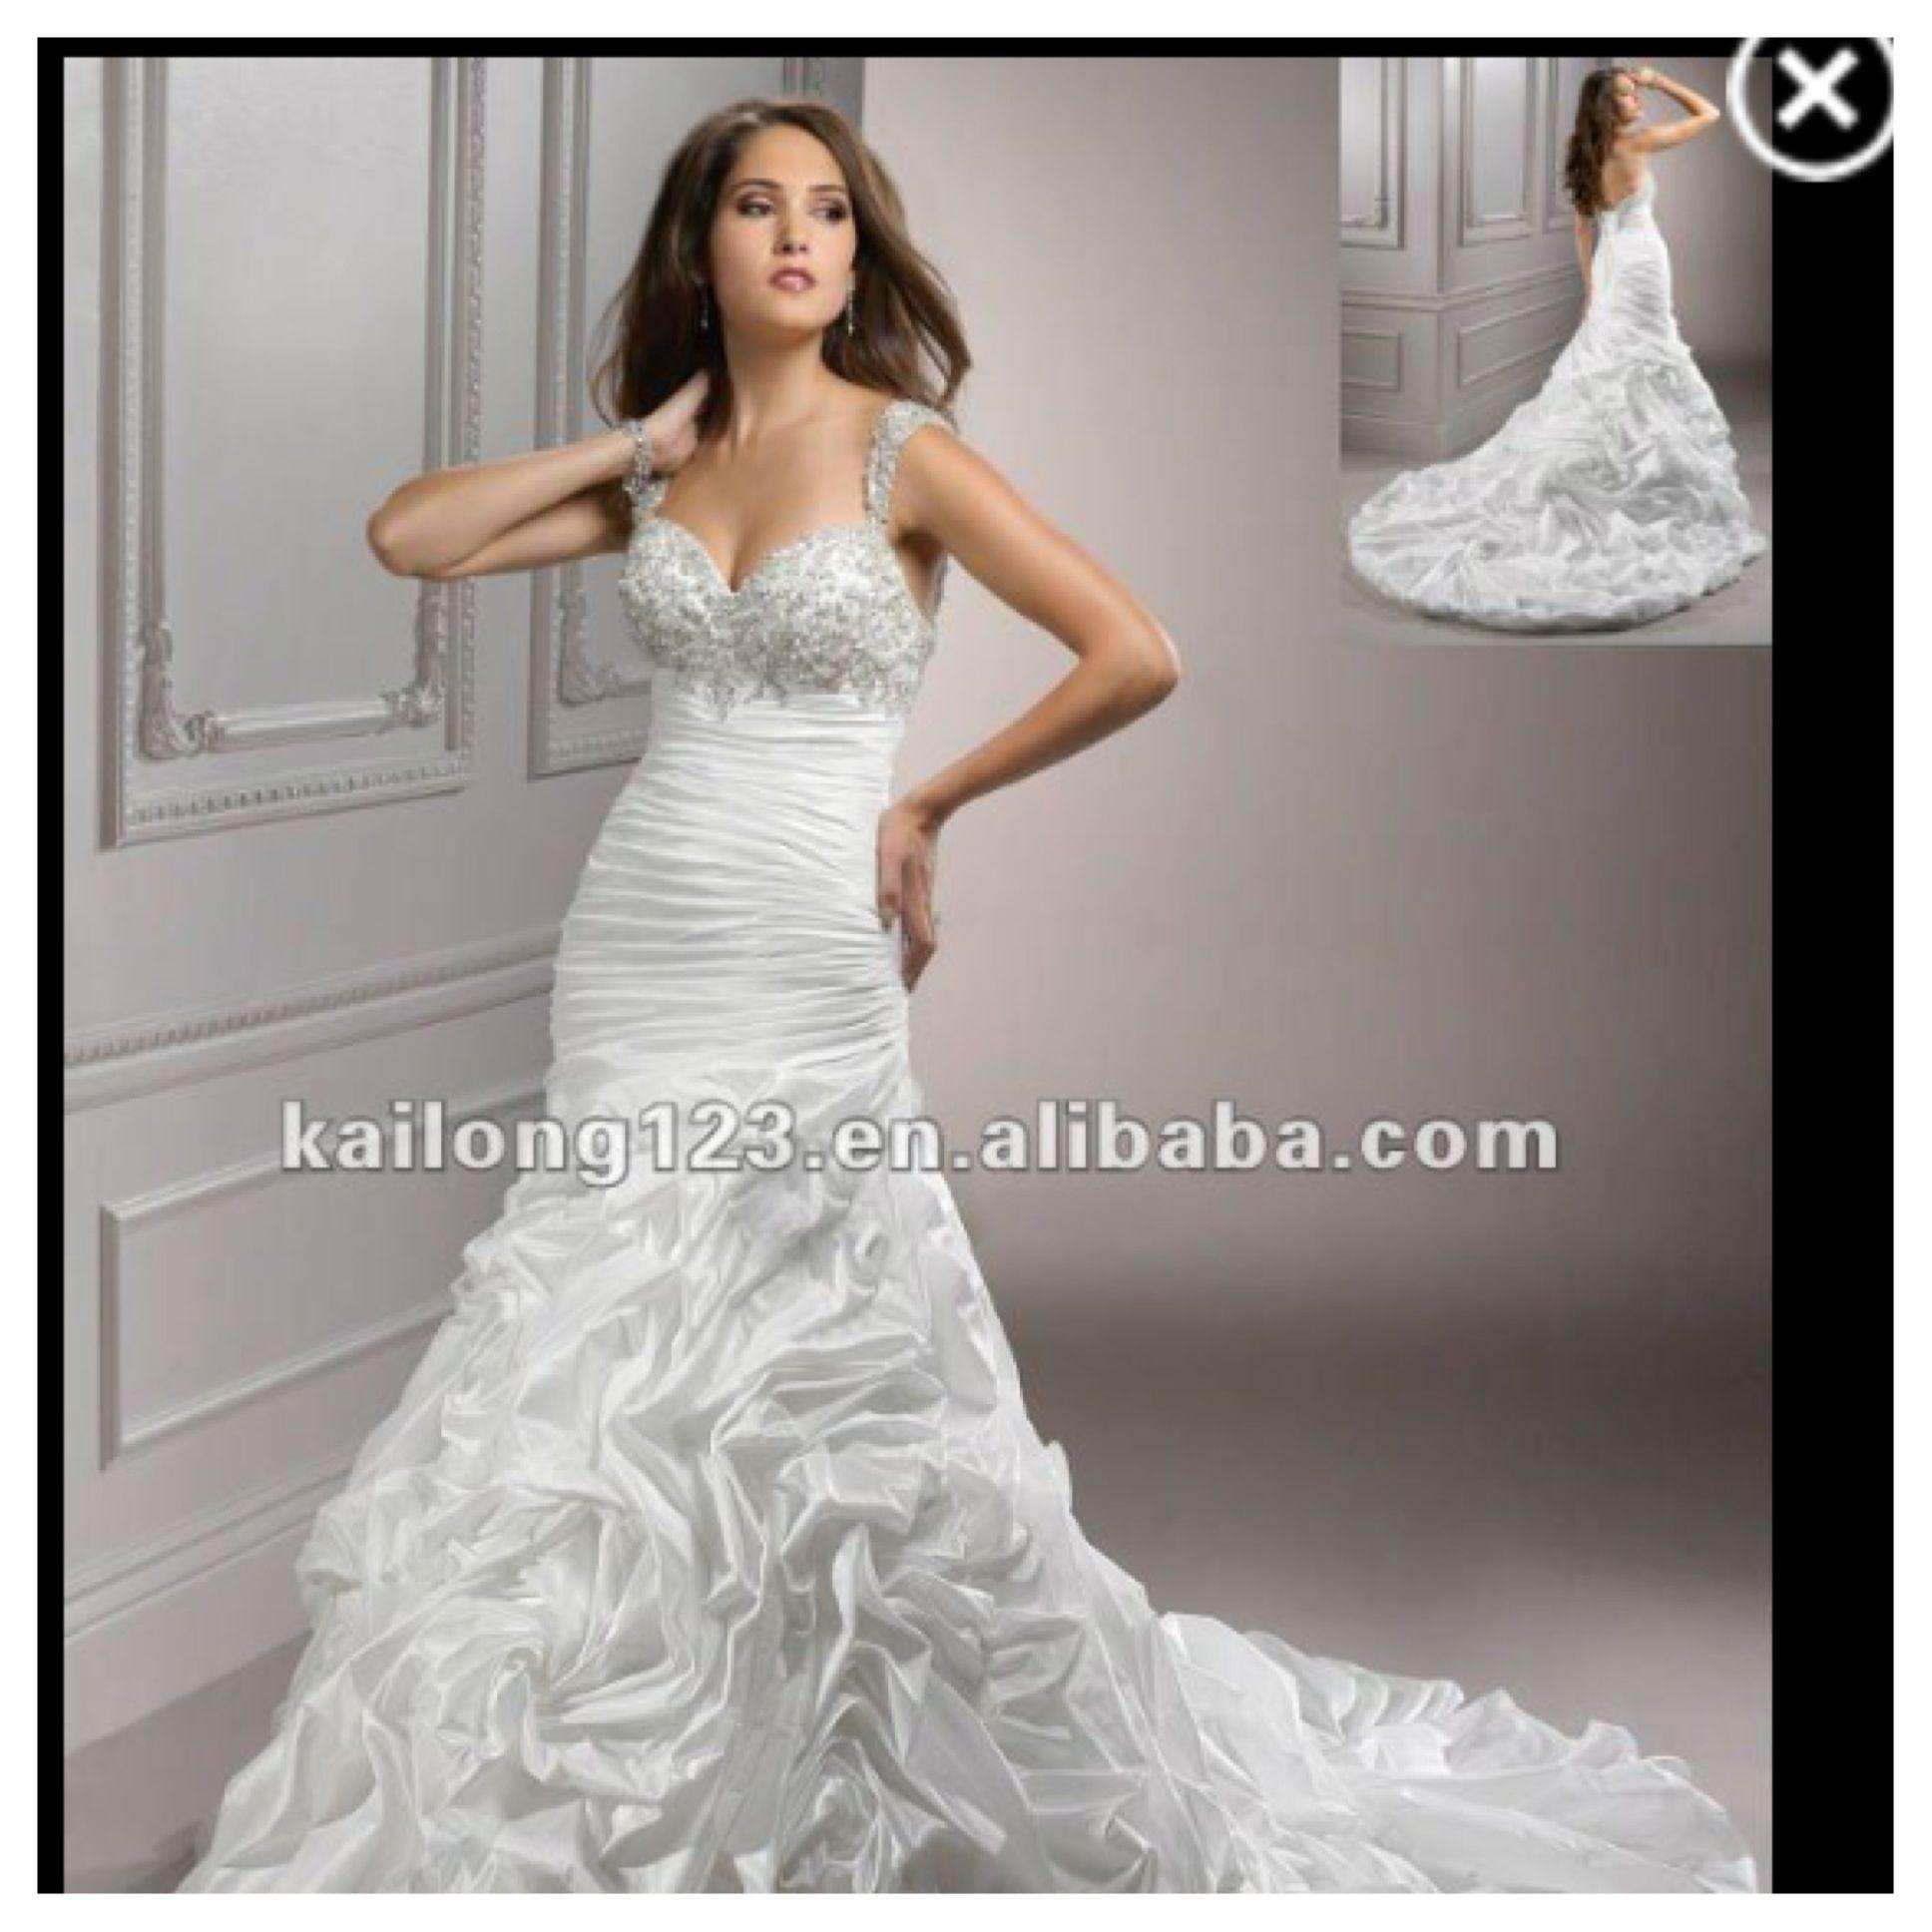 Mermaid dress w bling bodice and ruffled skirt wedding dresses explore mermaid wedding dresses and more ombrellifo Gallery